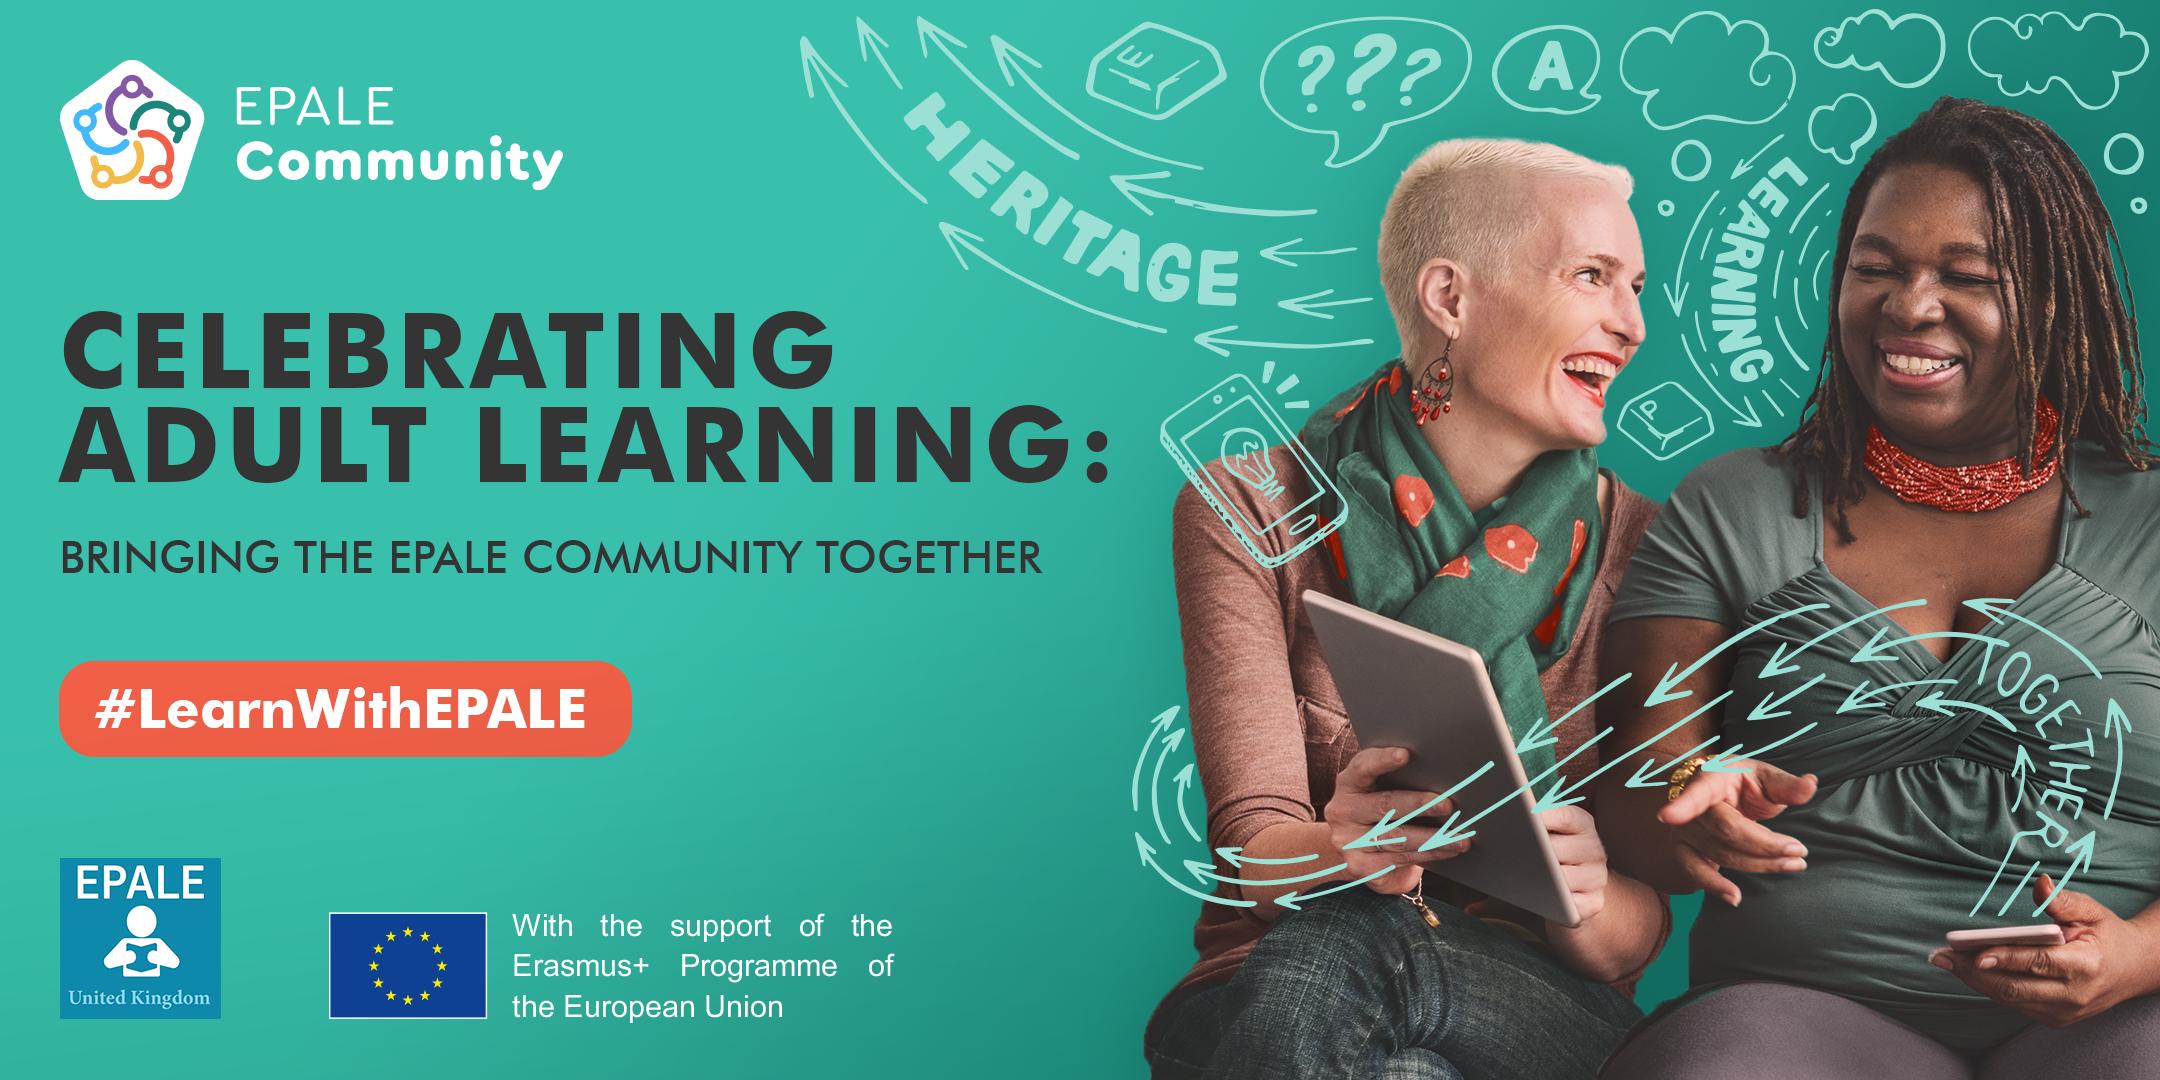 Celebrating Adult Learning: Bringing the EPALE Community Together